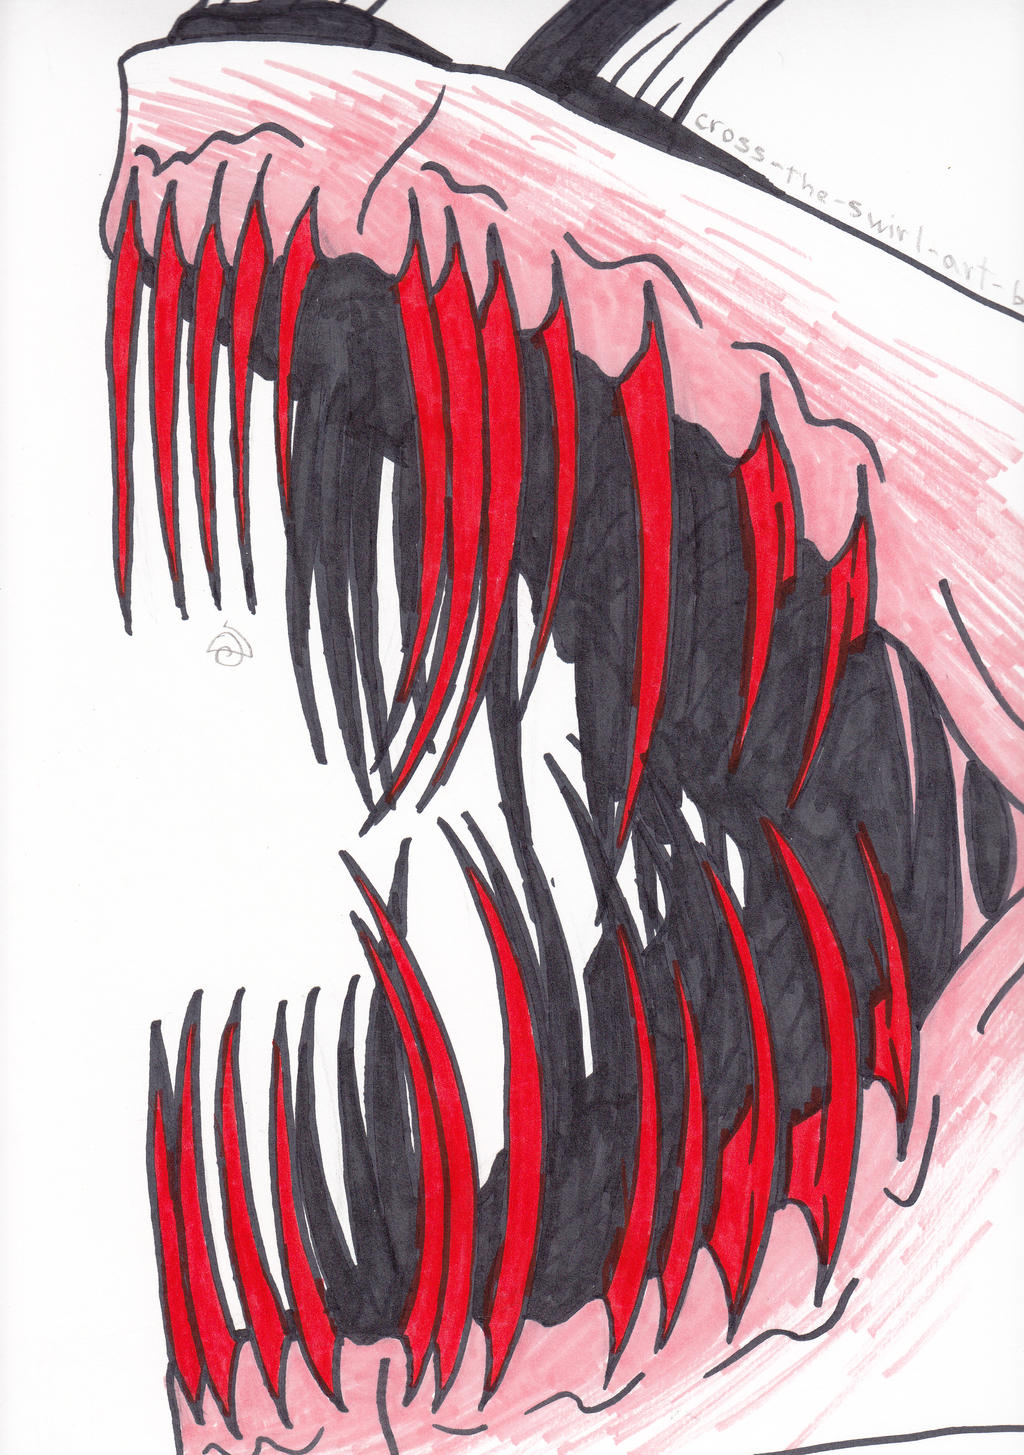 More Teeth by cross-the-swirl